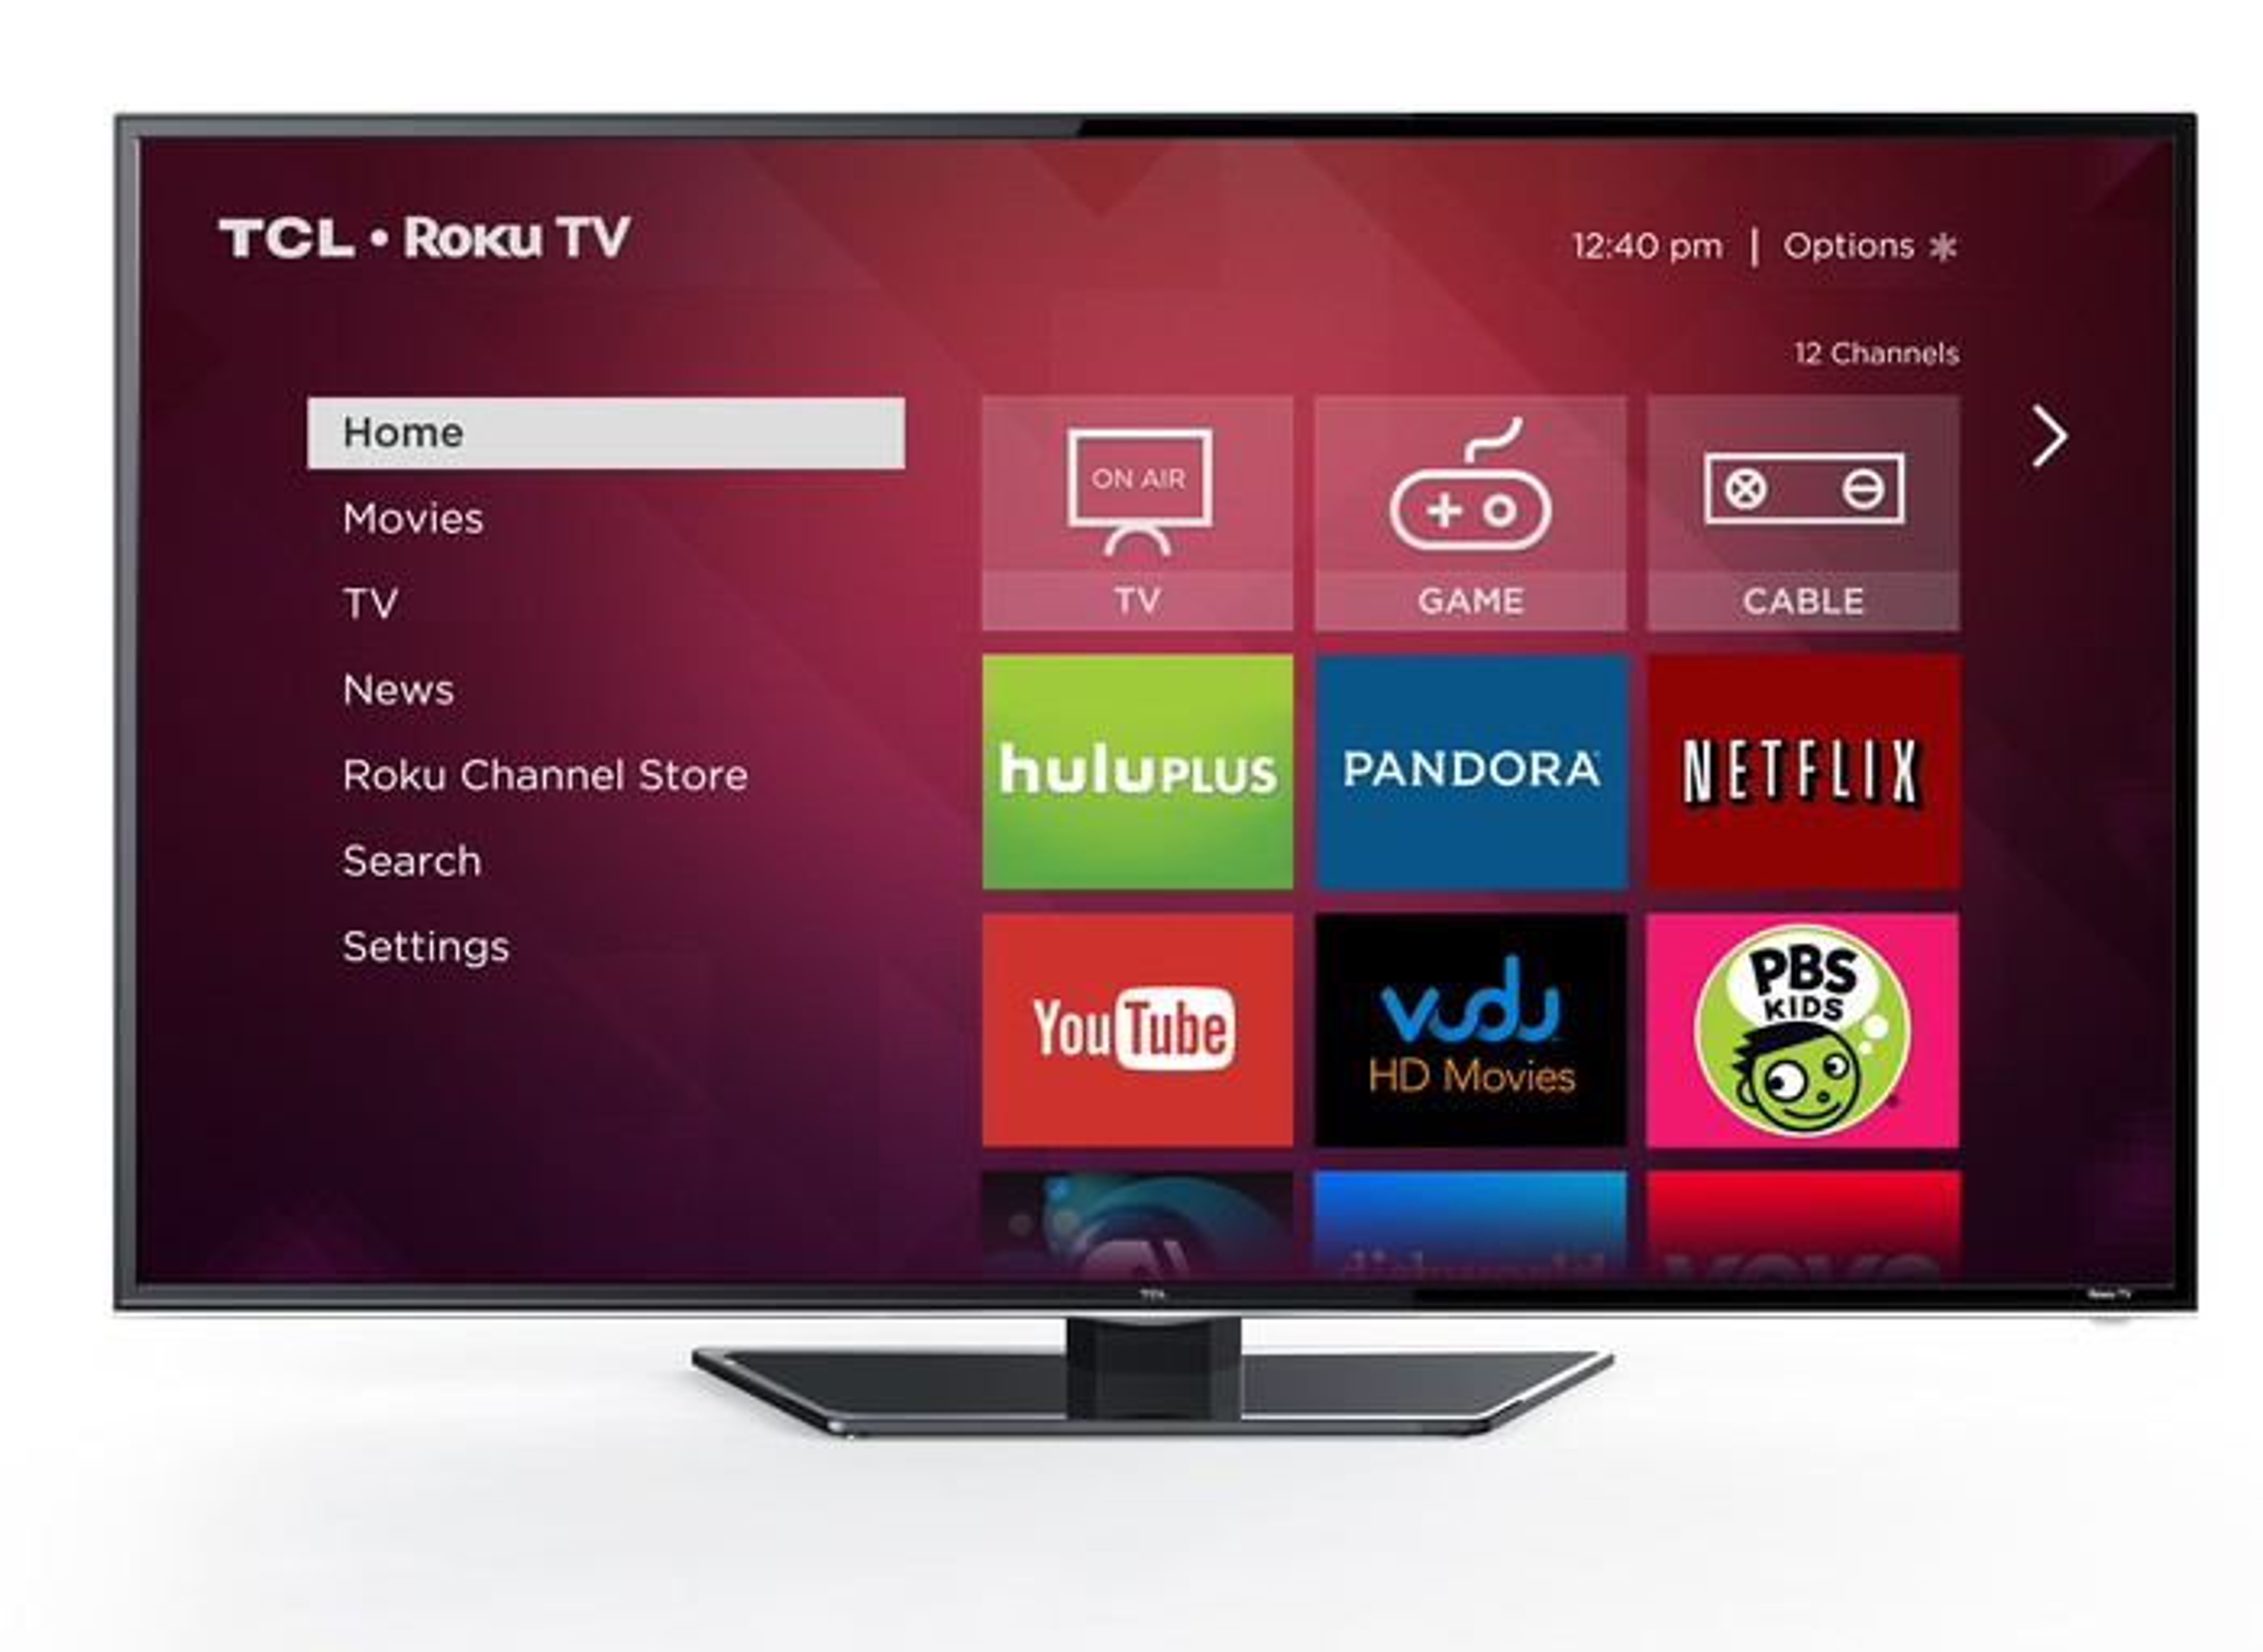 Roku TV on a TCL TV screen.